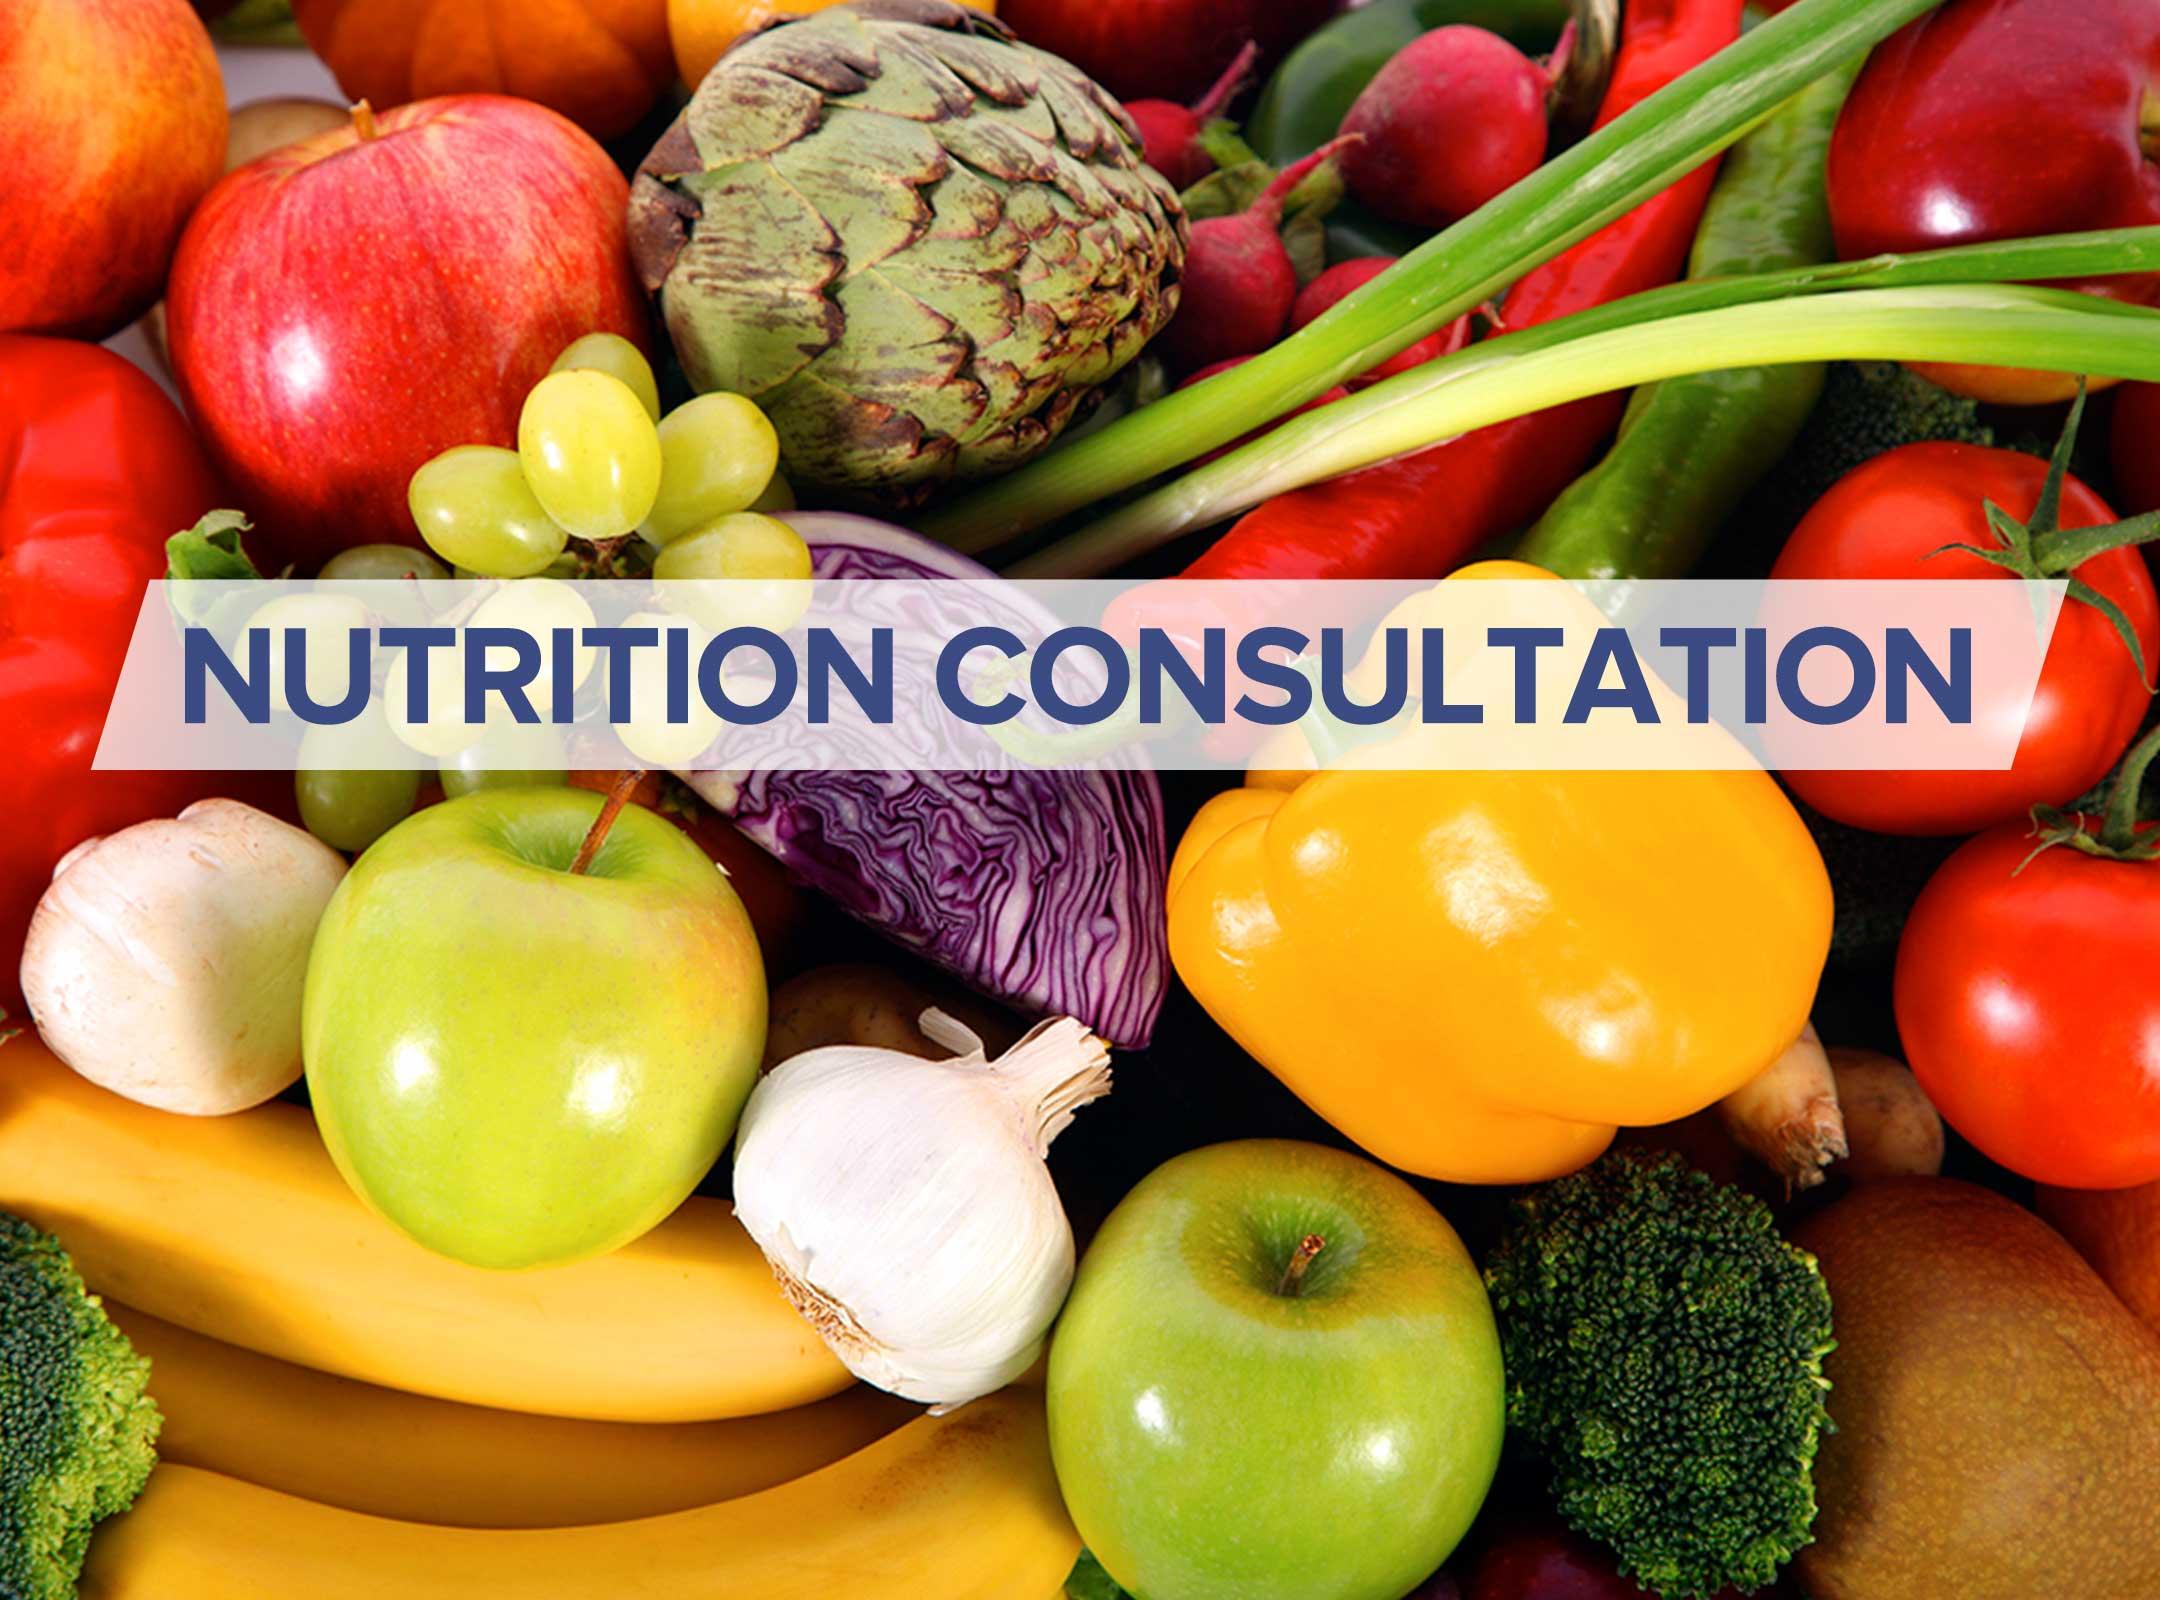 Nutrition Consultation